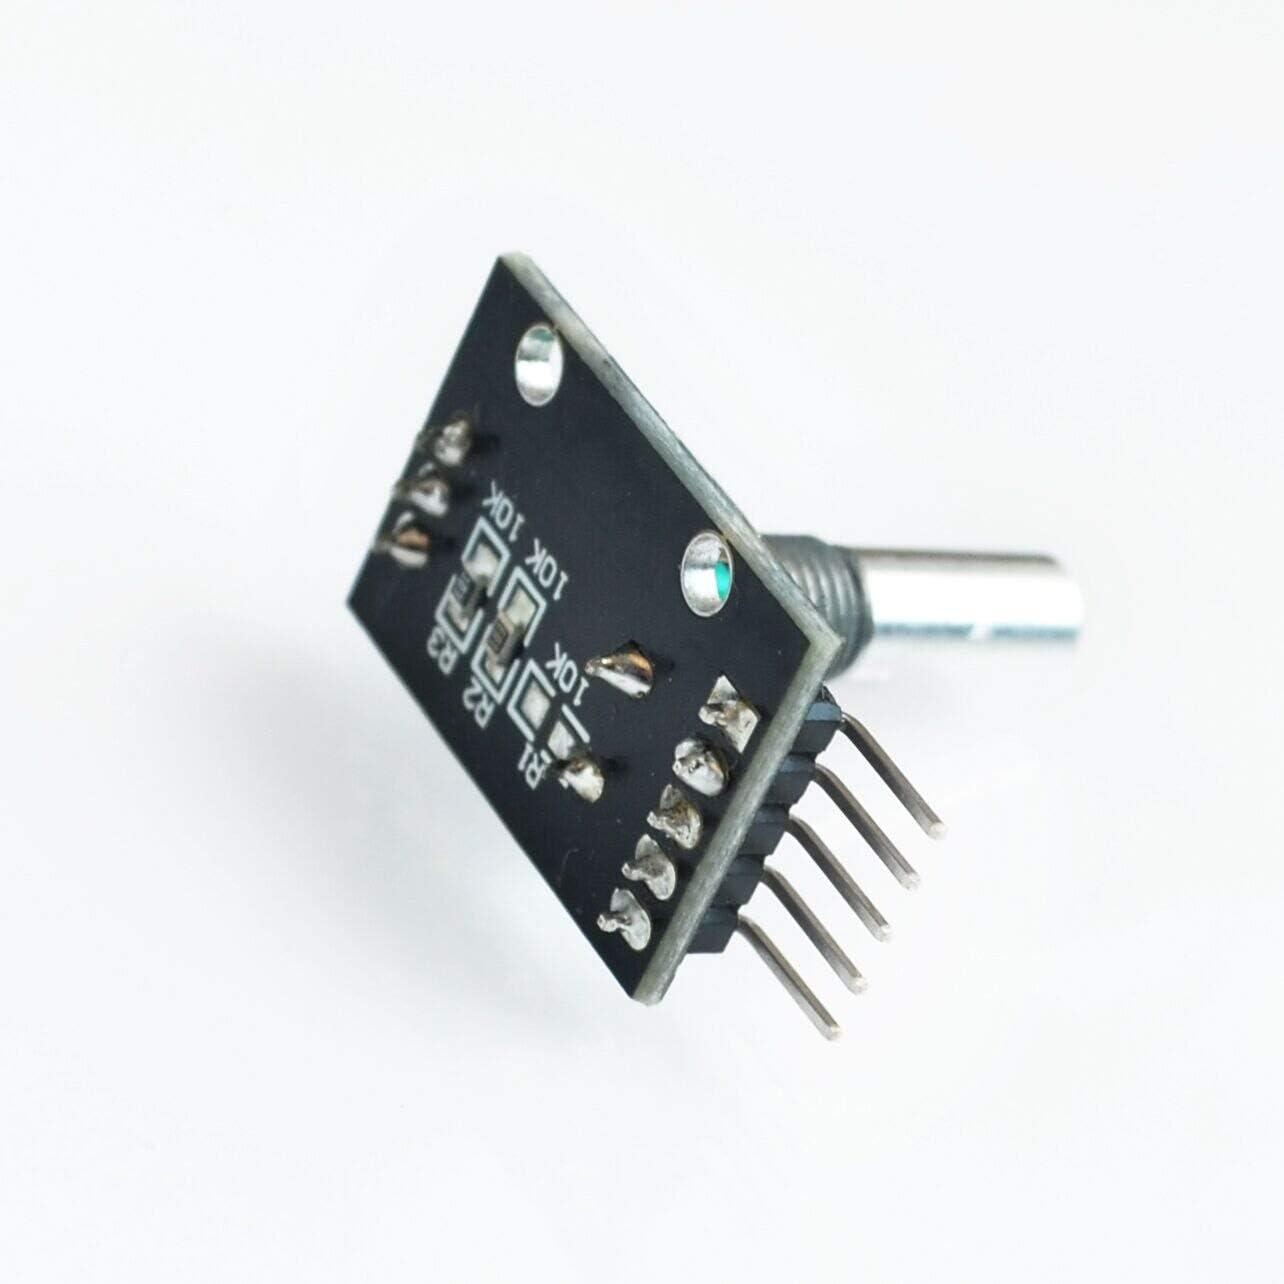 TD-ELECTRO Rotary Encoder Module Brick Sensor Development KY-040